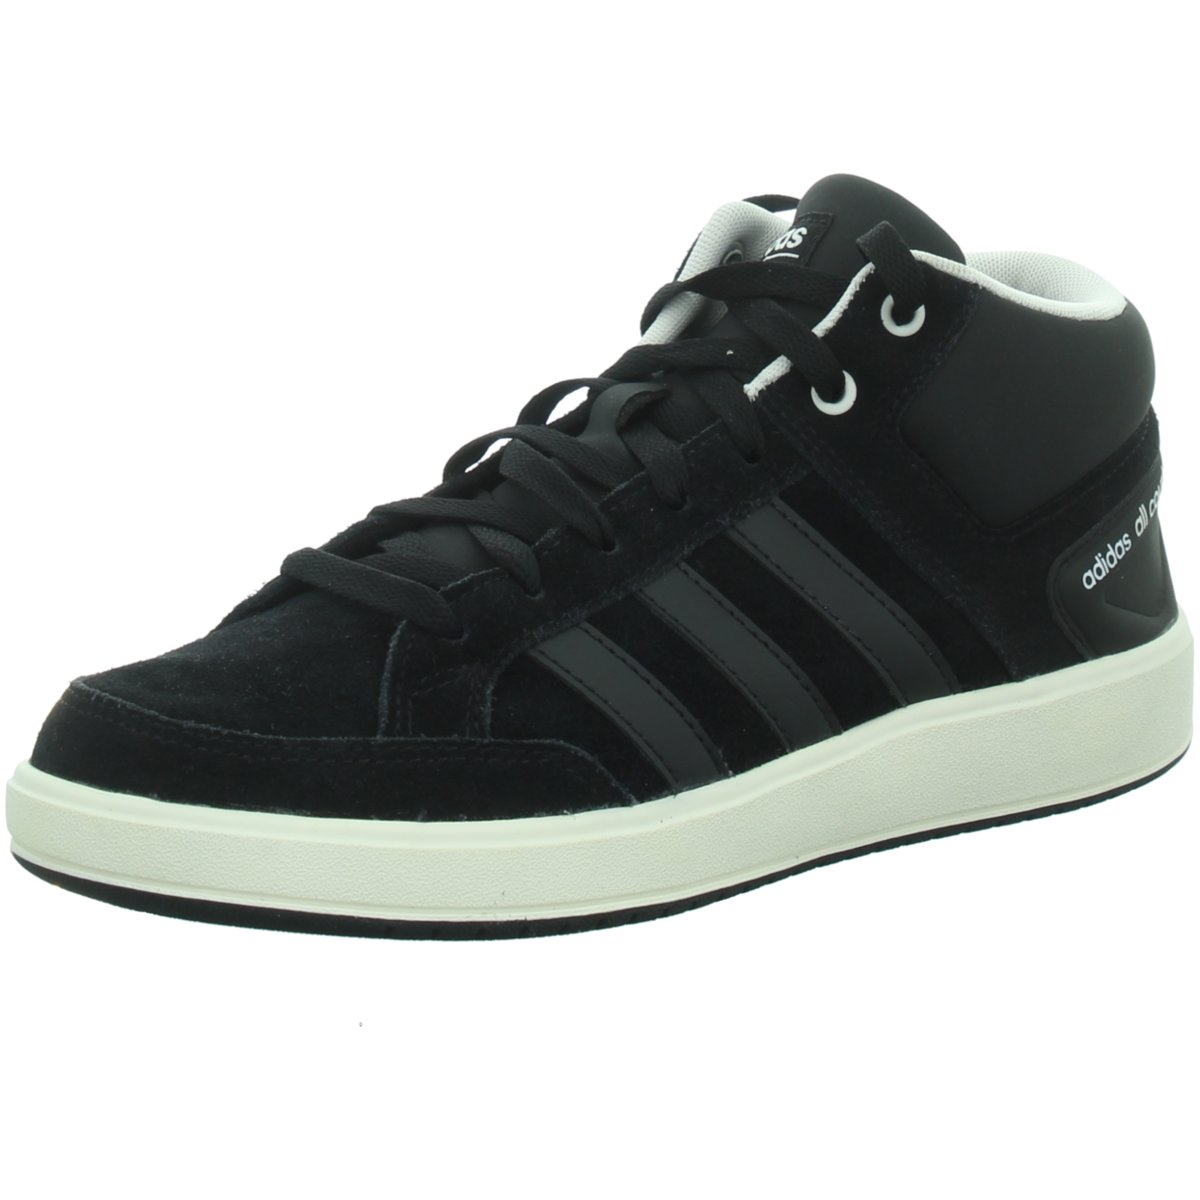 NEU adidas Herren Sneaker CF ALL COURT MID BB9955 schwarz 469088